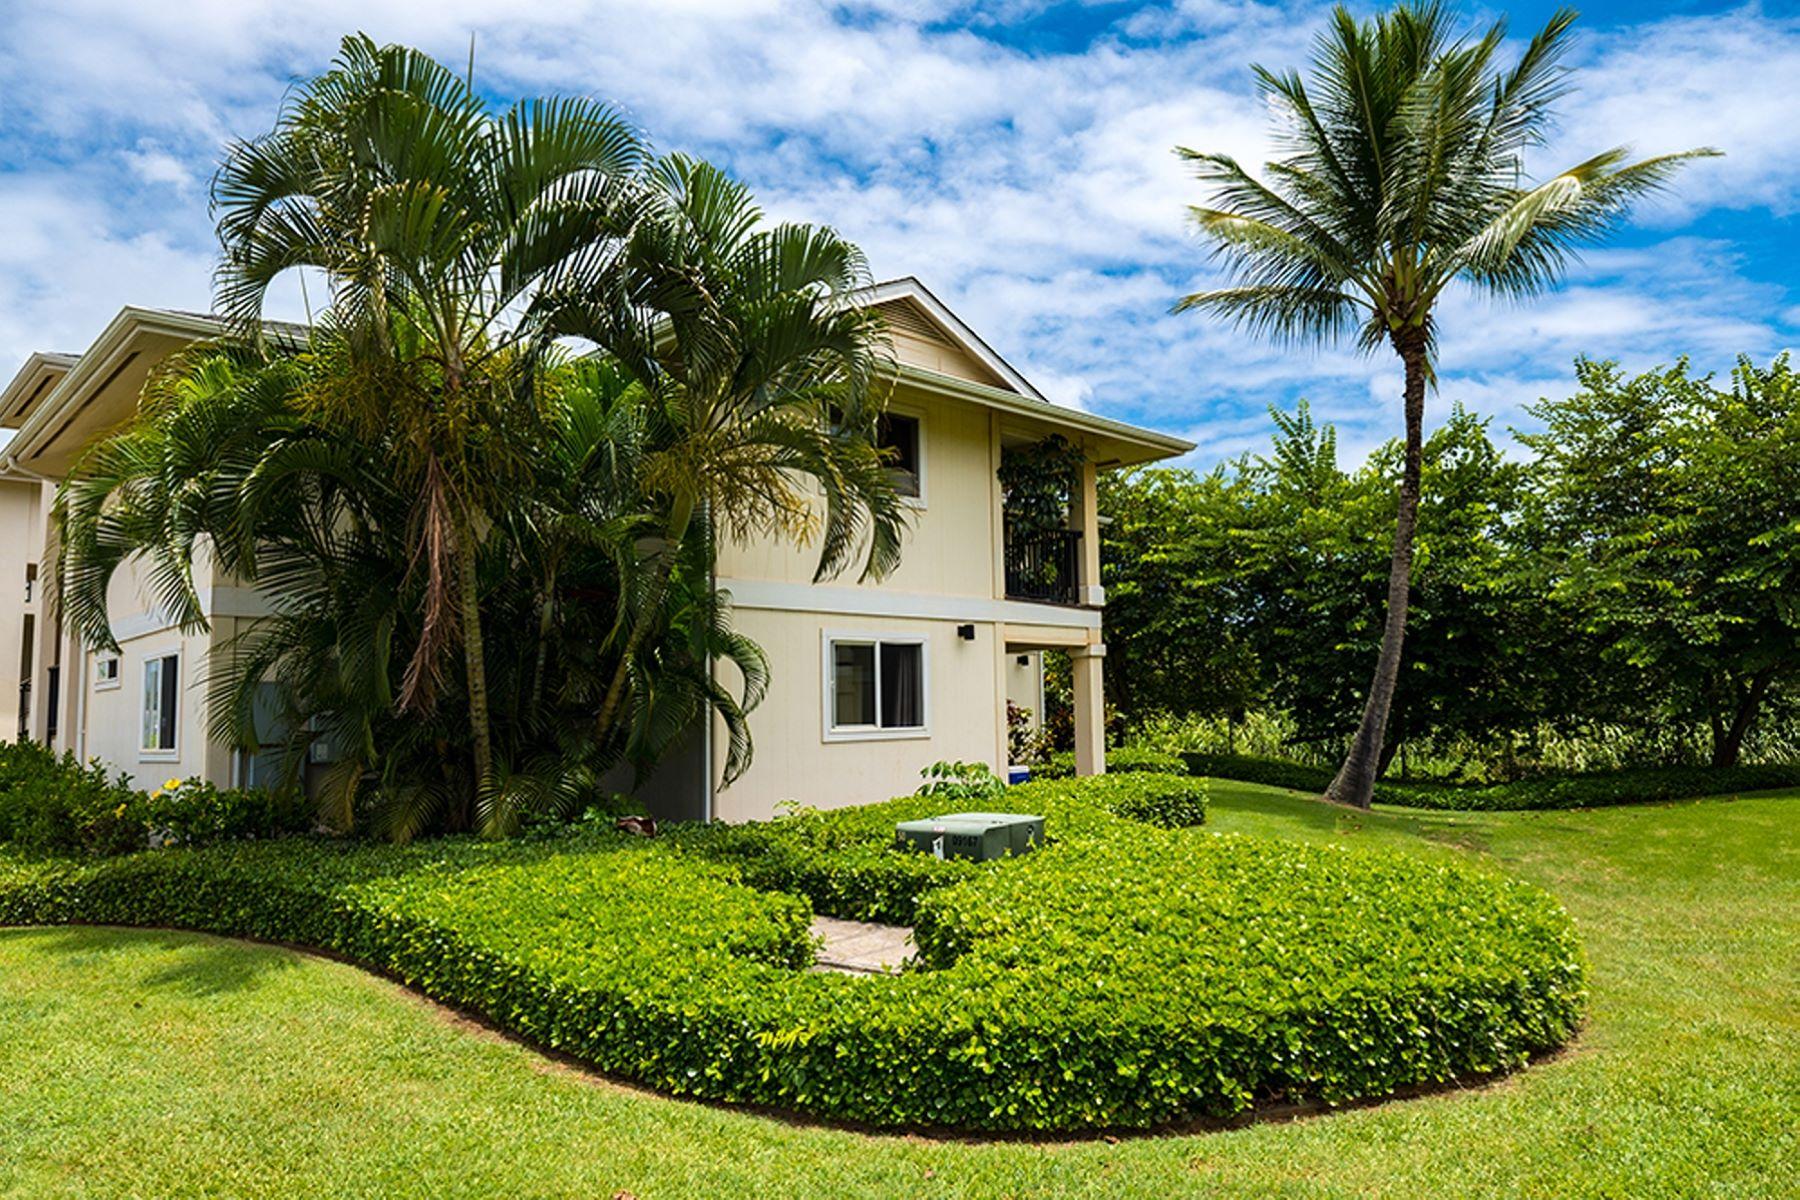 Condominiums 為 出售 在 Kamamalu 3920 Haoa St #125, Lihue, 夏威夷 96766 美國